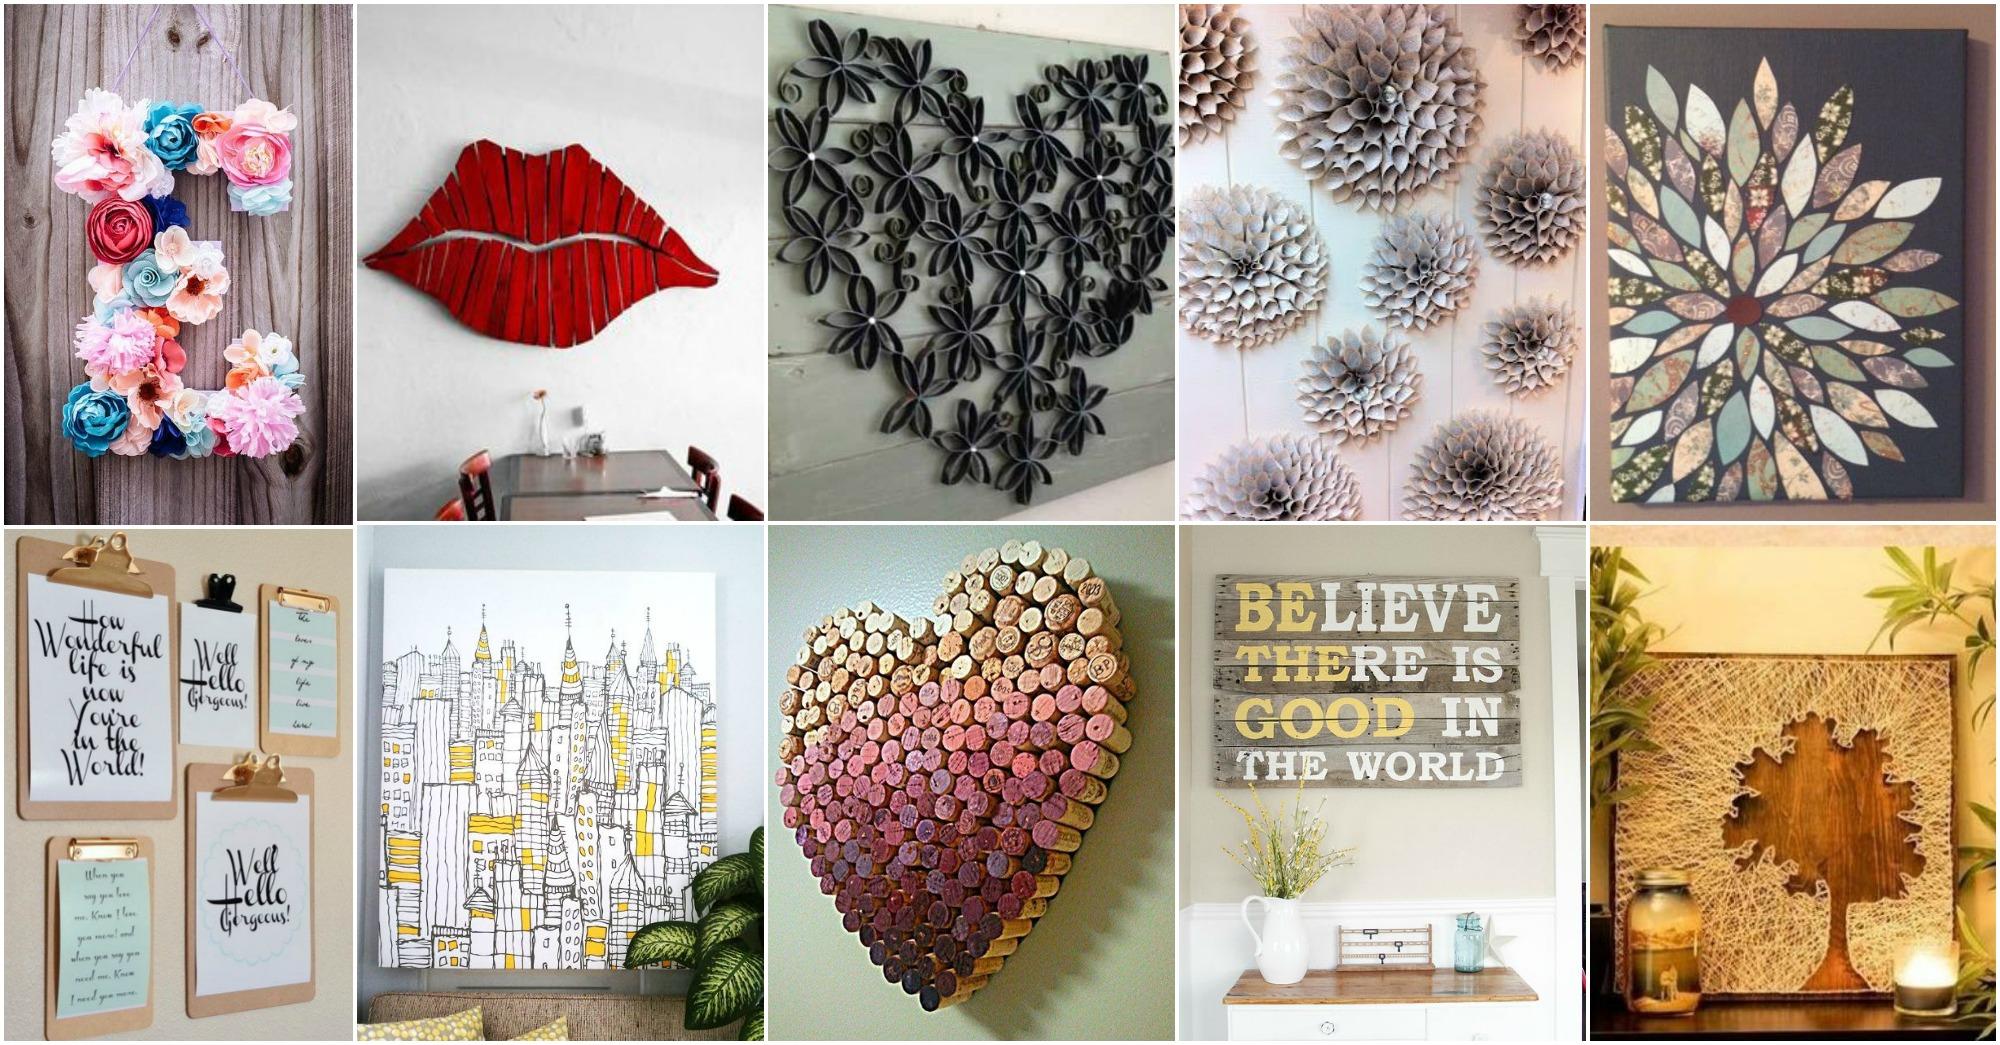 20 DIY Innovative Wall Art Decor Ideas That Will Leave You ... on Pinterest Wall Decor  id=16867